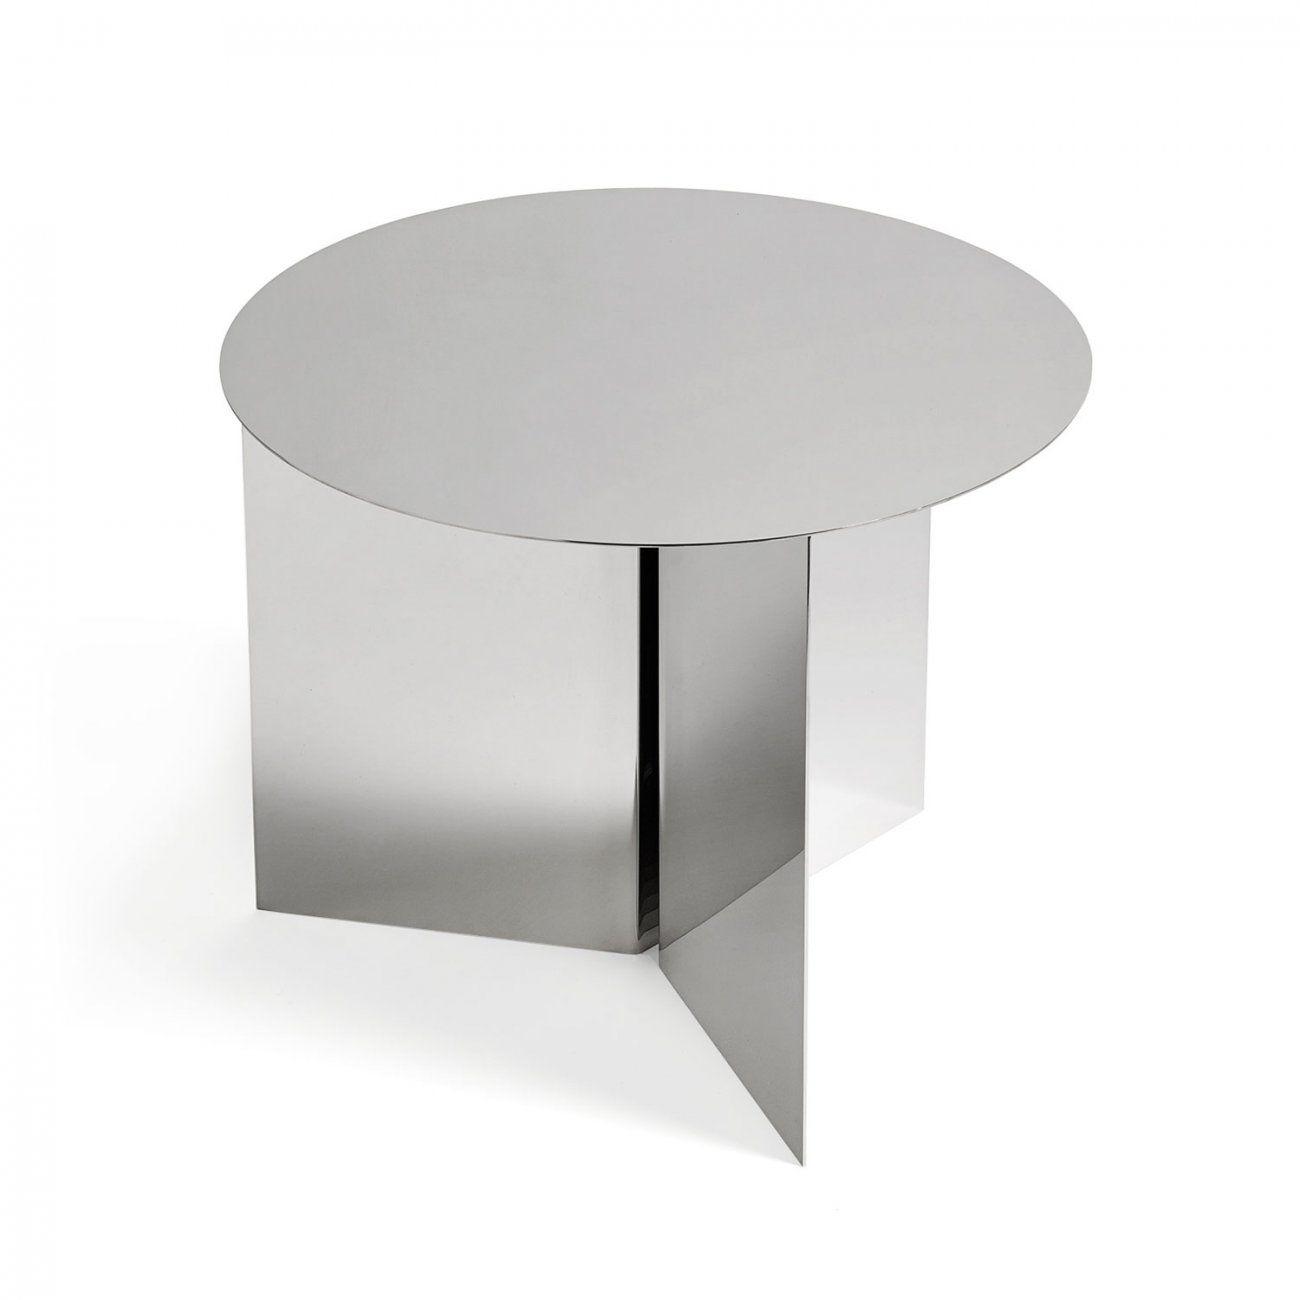 Slit Table Sidobord   HAY   Länna Möbler   Handla online